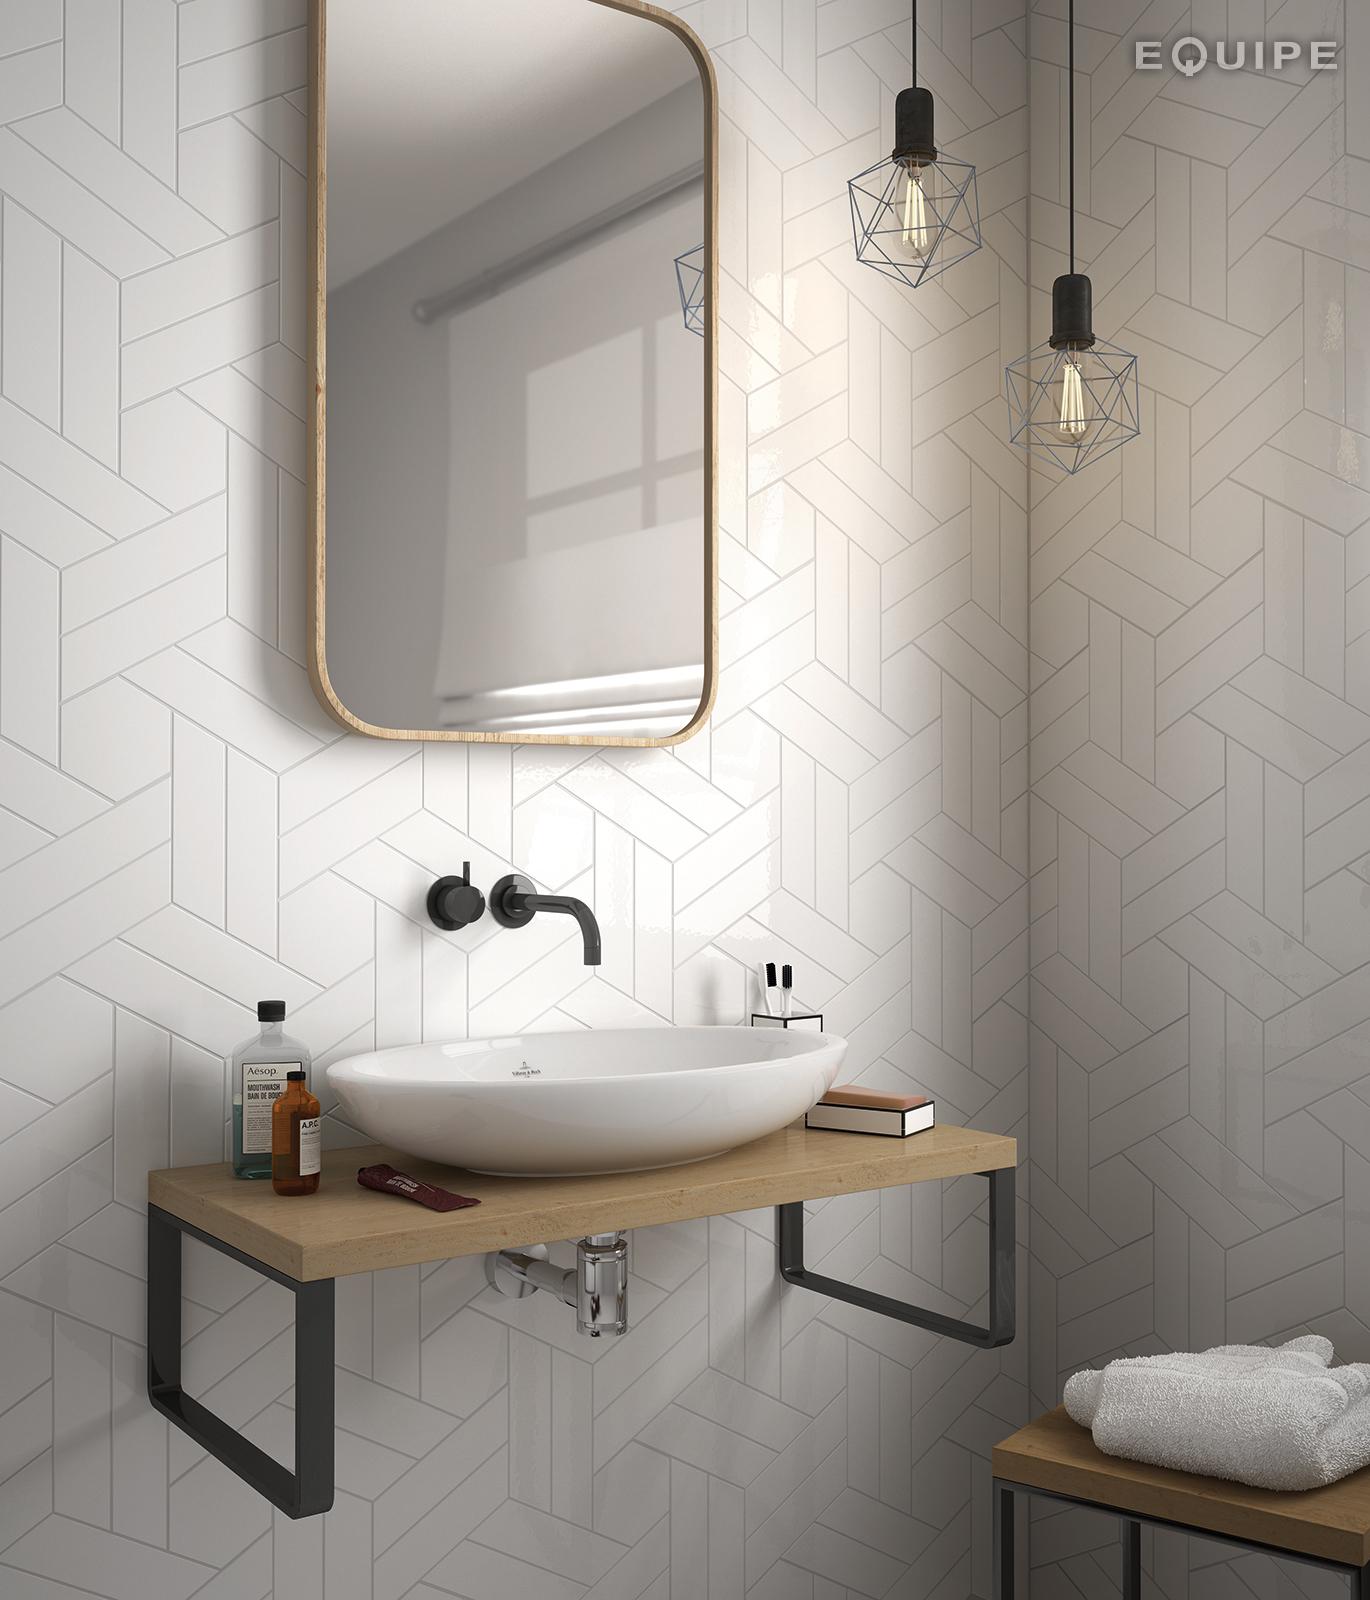 ChevronWall White Scale White Bathroom